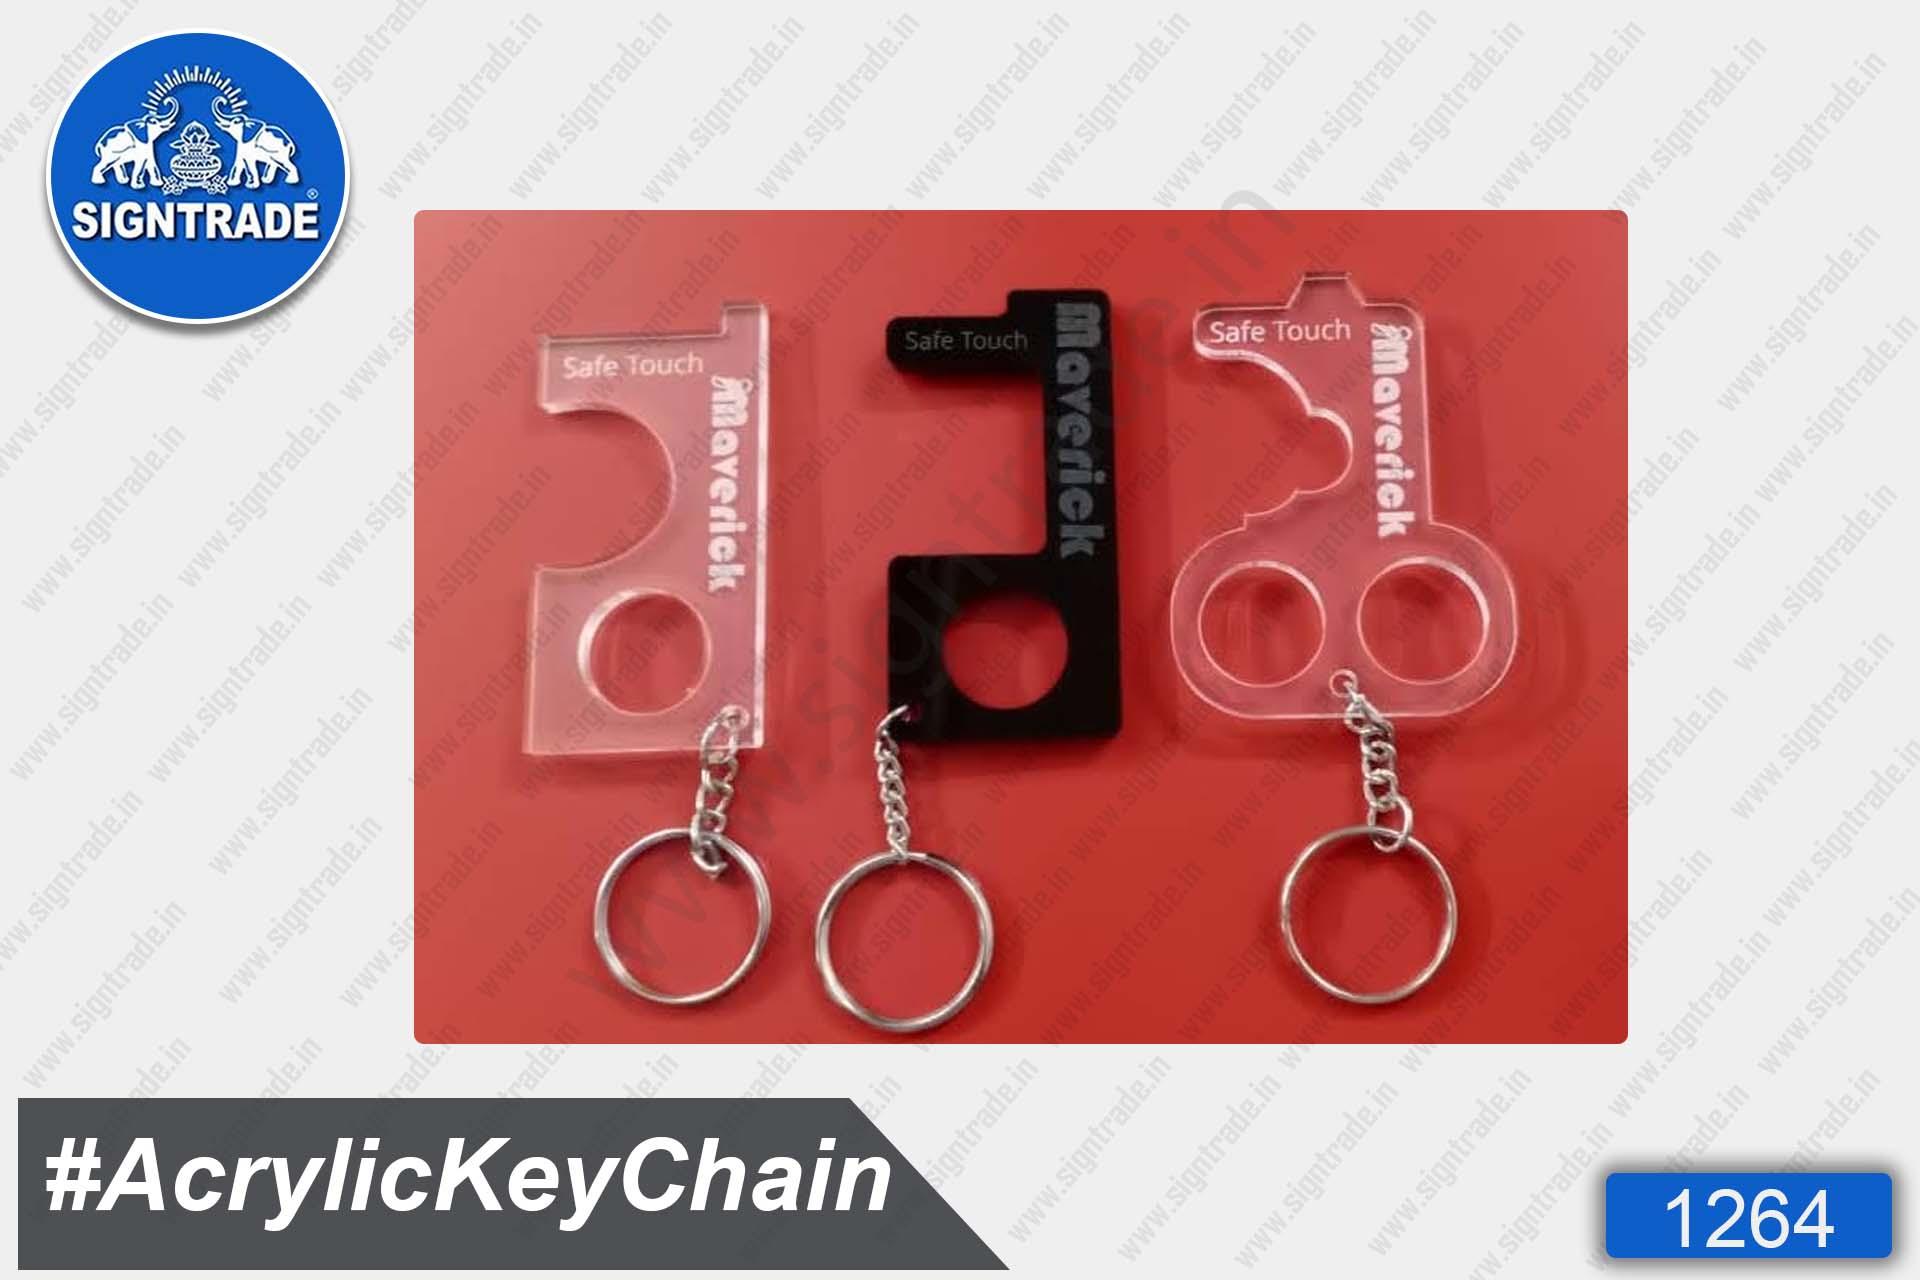 Acrylic Safetouch Keychain (Black)